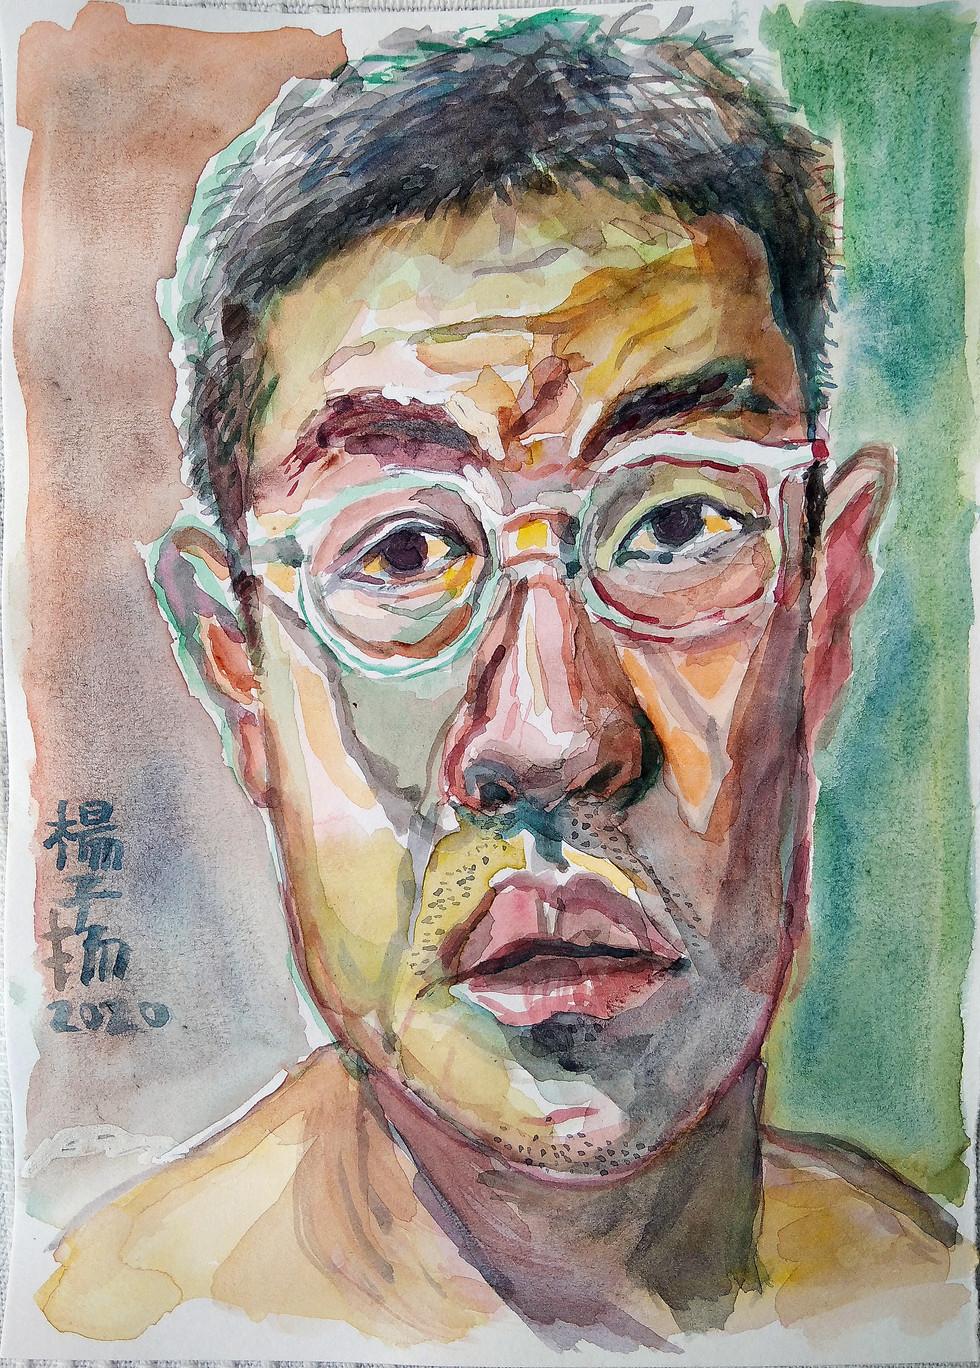 Self Portrait, 2020, Watercolour and correction fluid on paper, 21 x 14.9cm